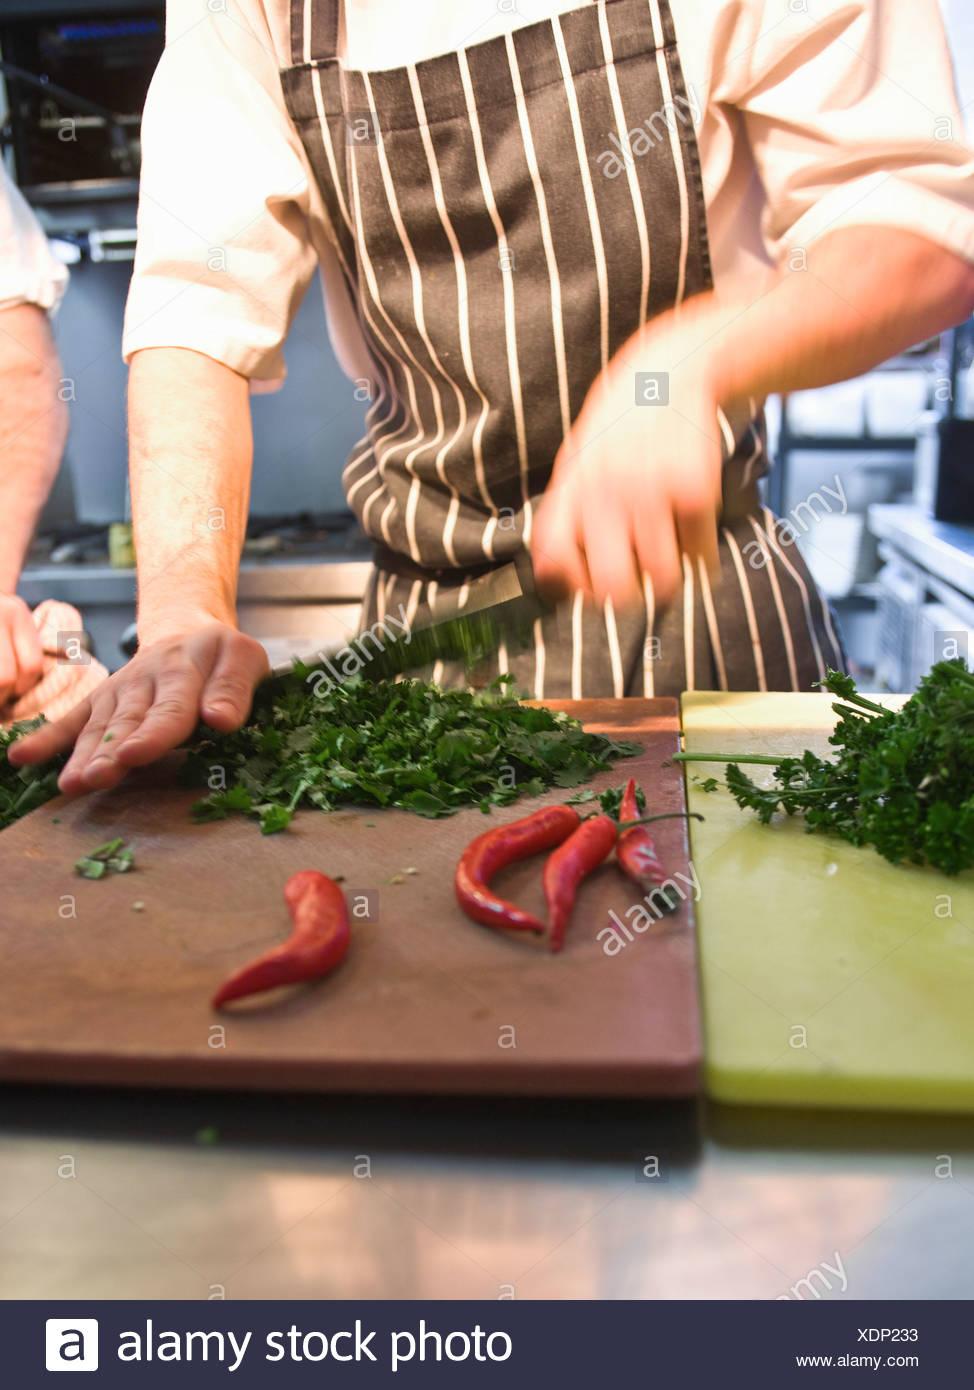 Chef chopping in restaurant kitchen - Stock Image